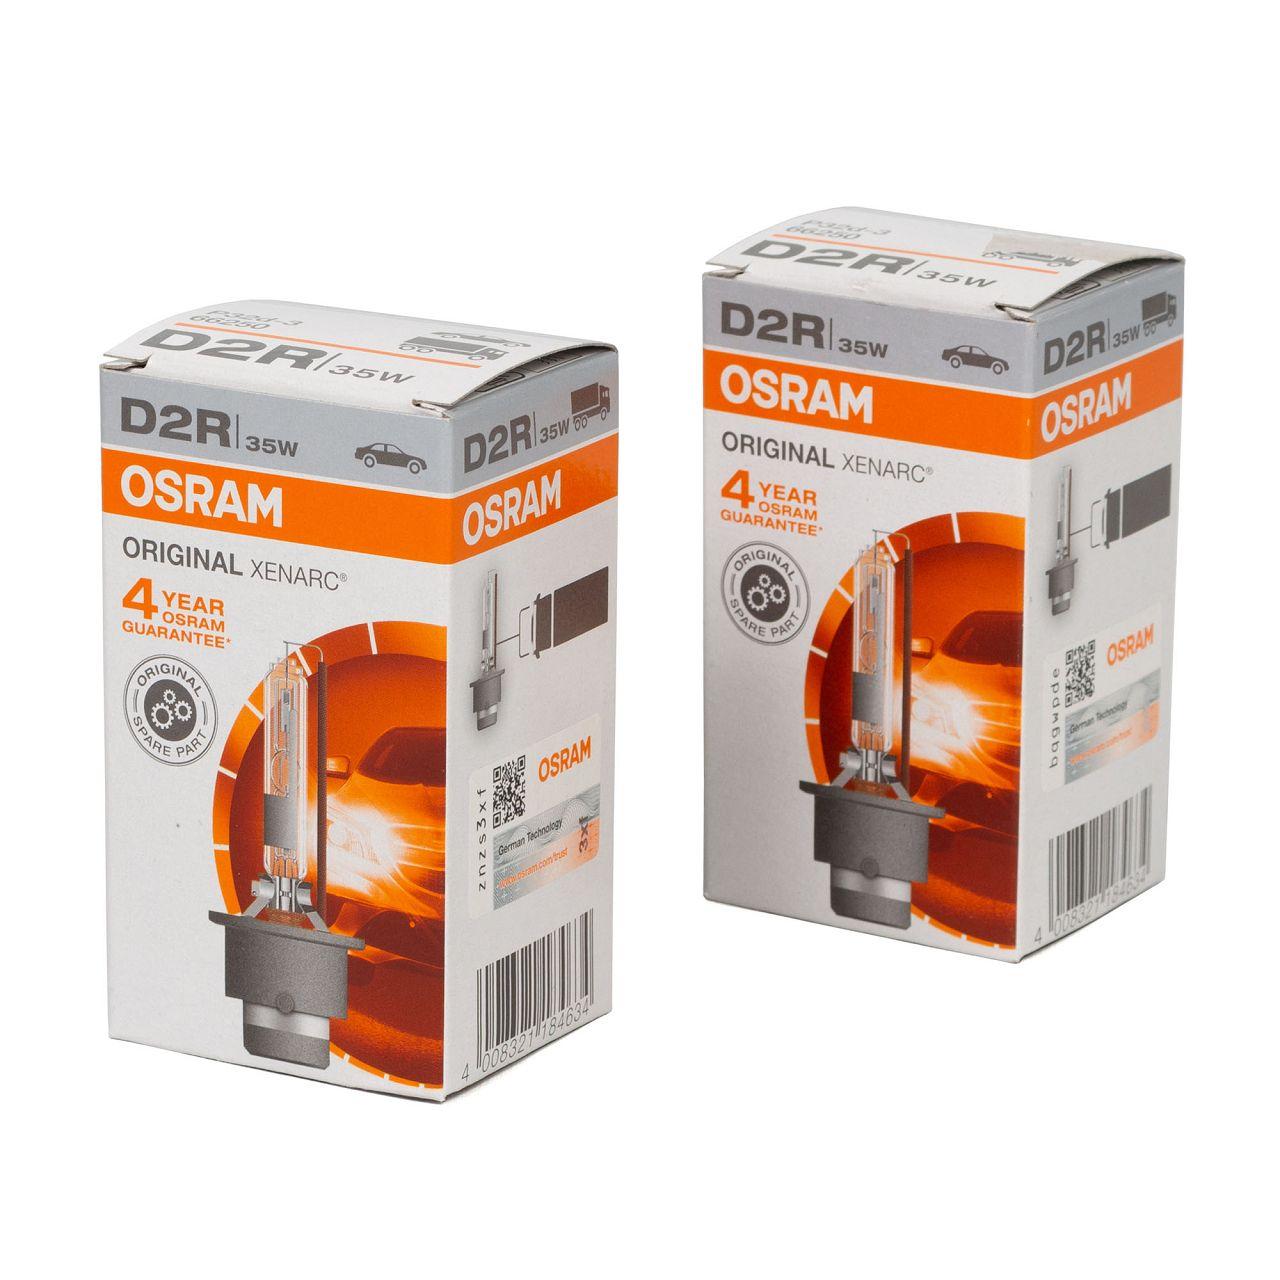 2x OSRAM Xenarc Xenon Brenner D2R ORIGINAL 85V 35W P32d-3 66250